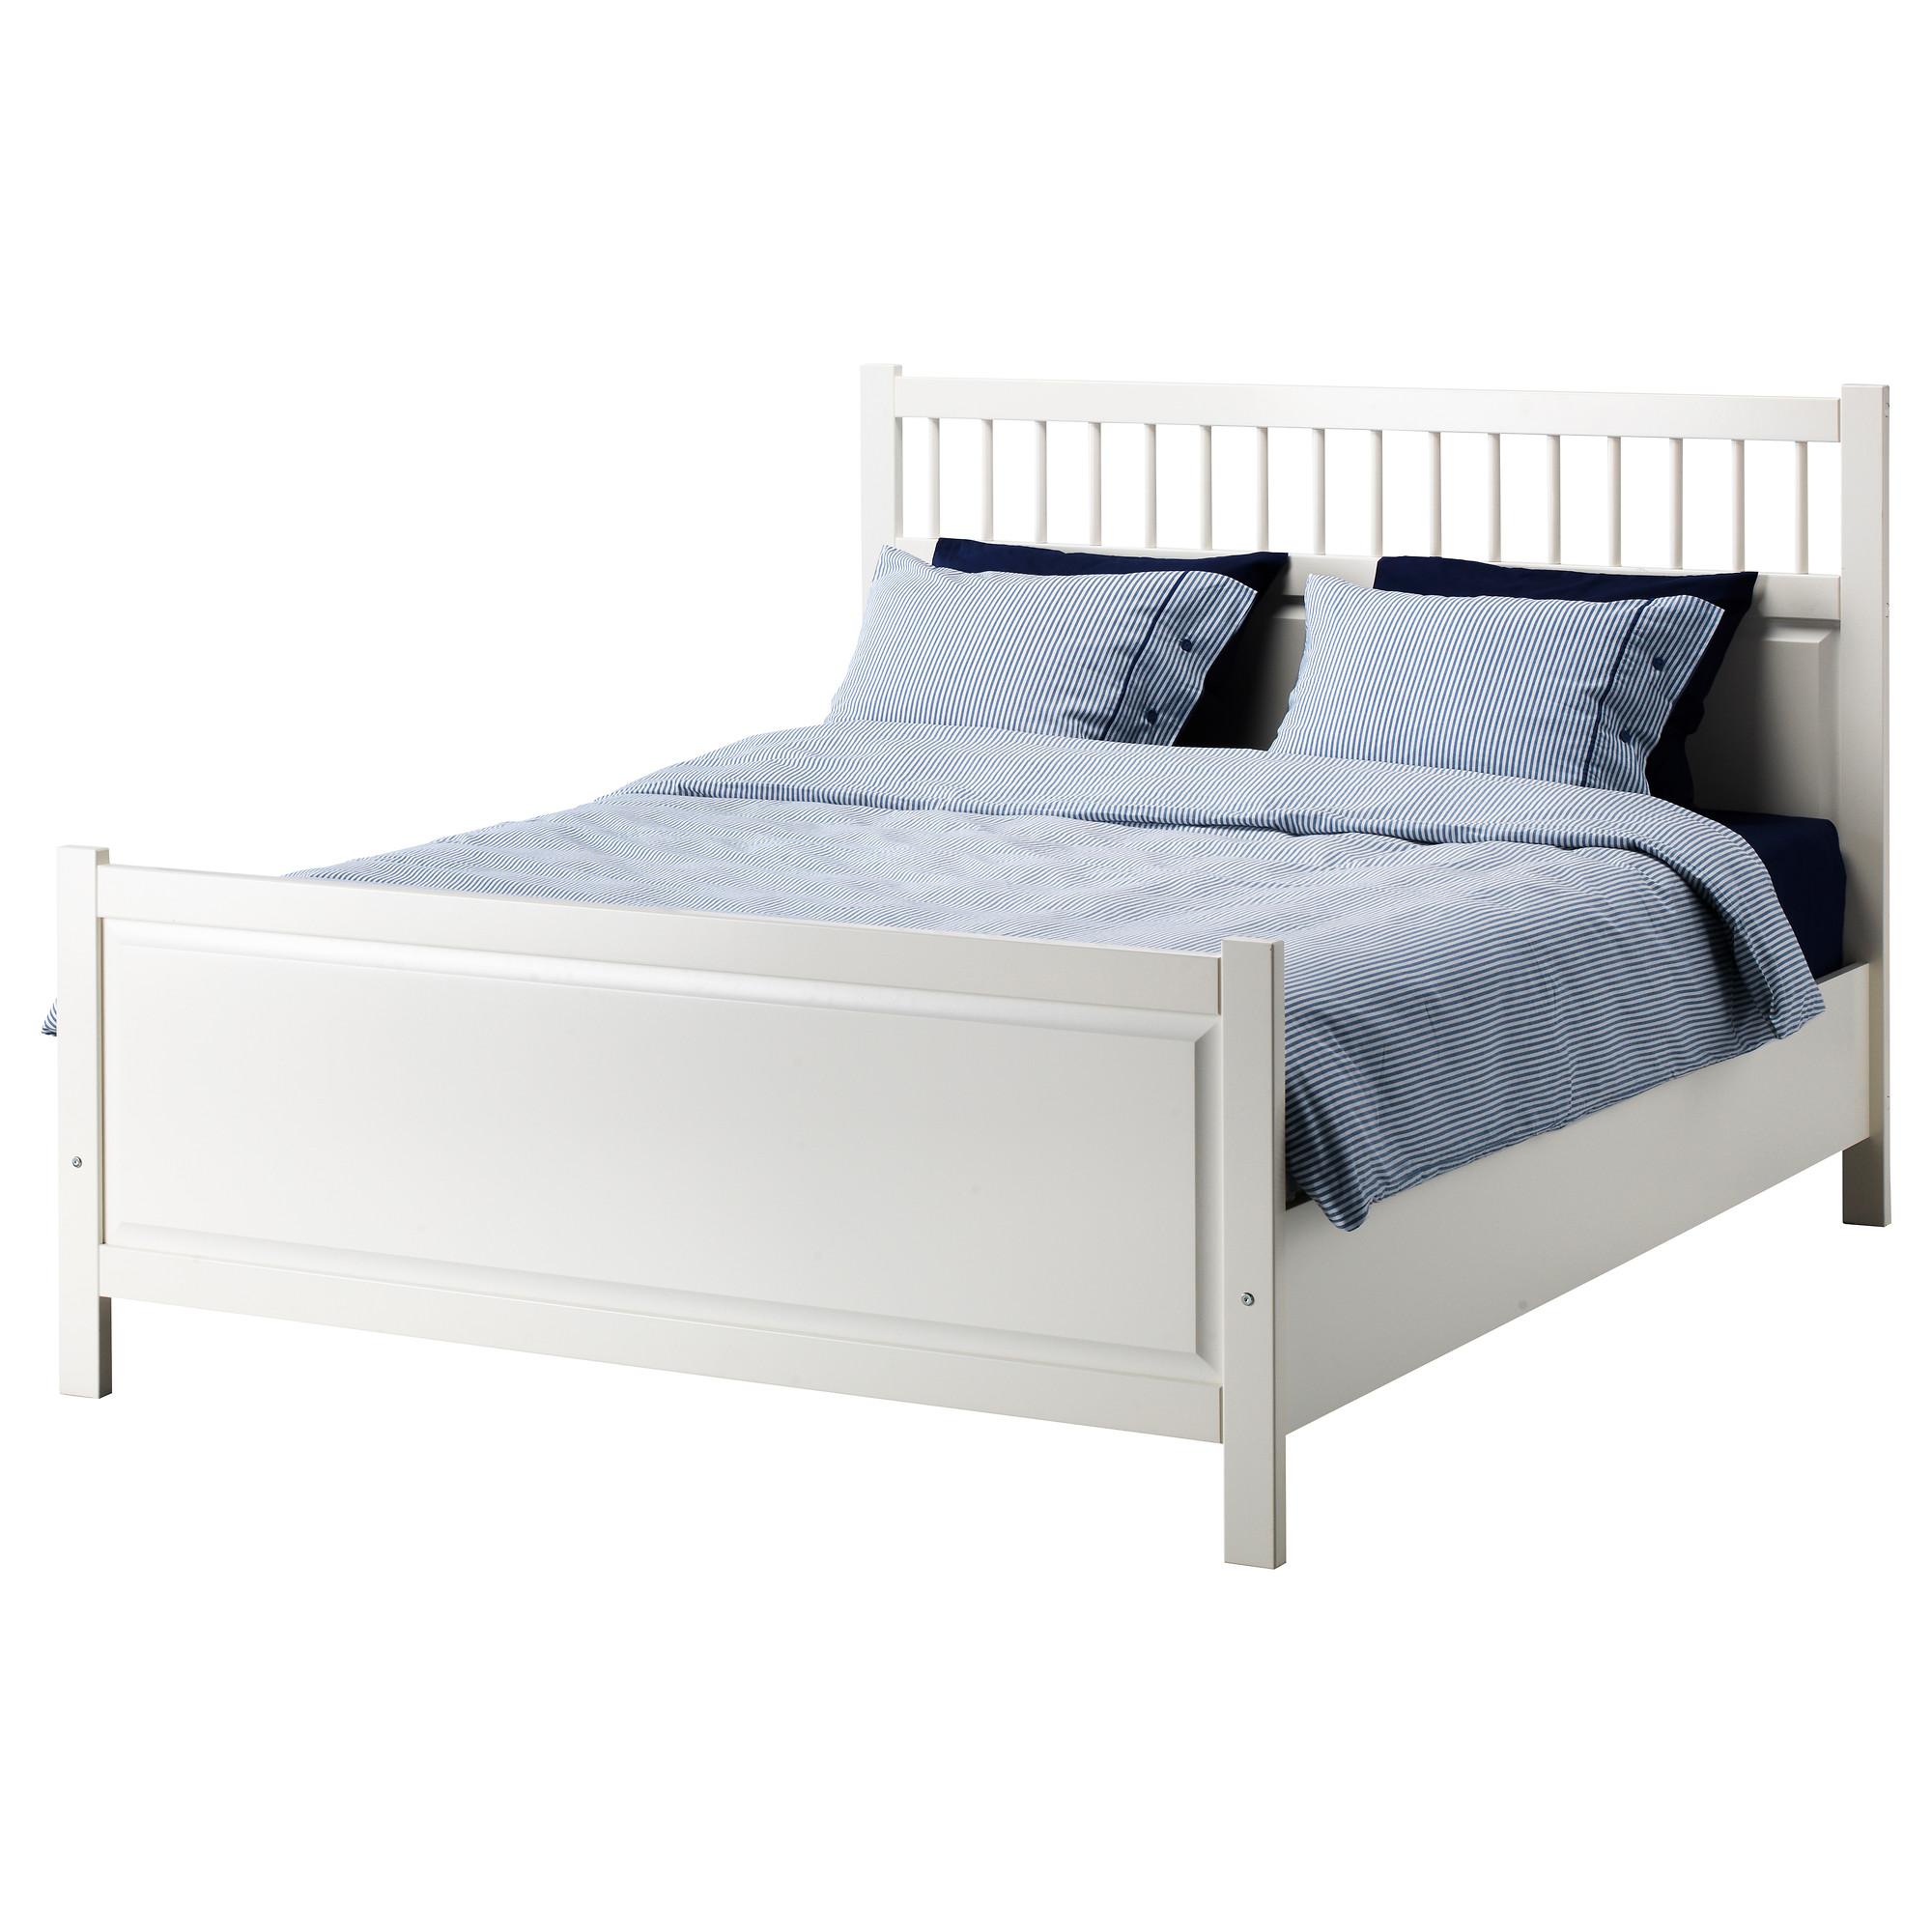 Ikea Bed Frame White Wooden And Blue Bedding King Platform